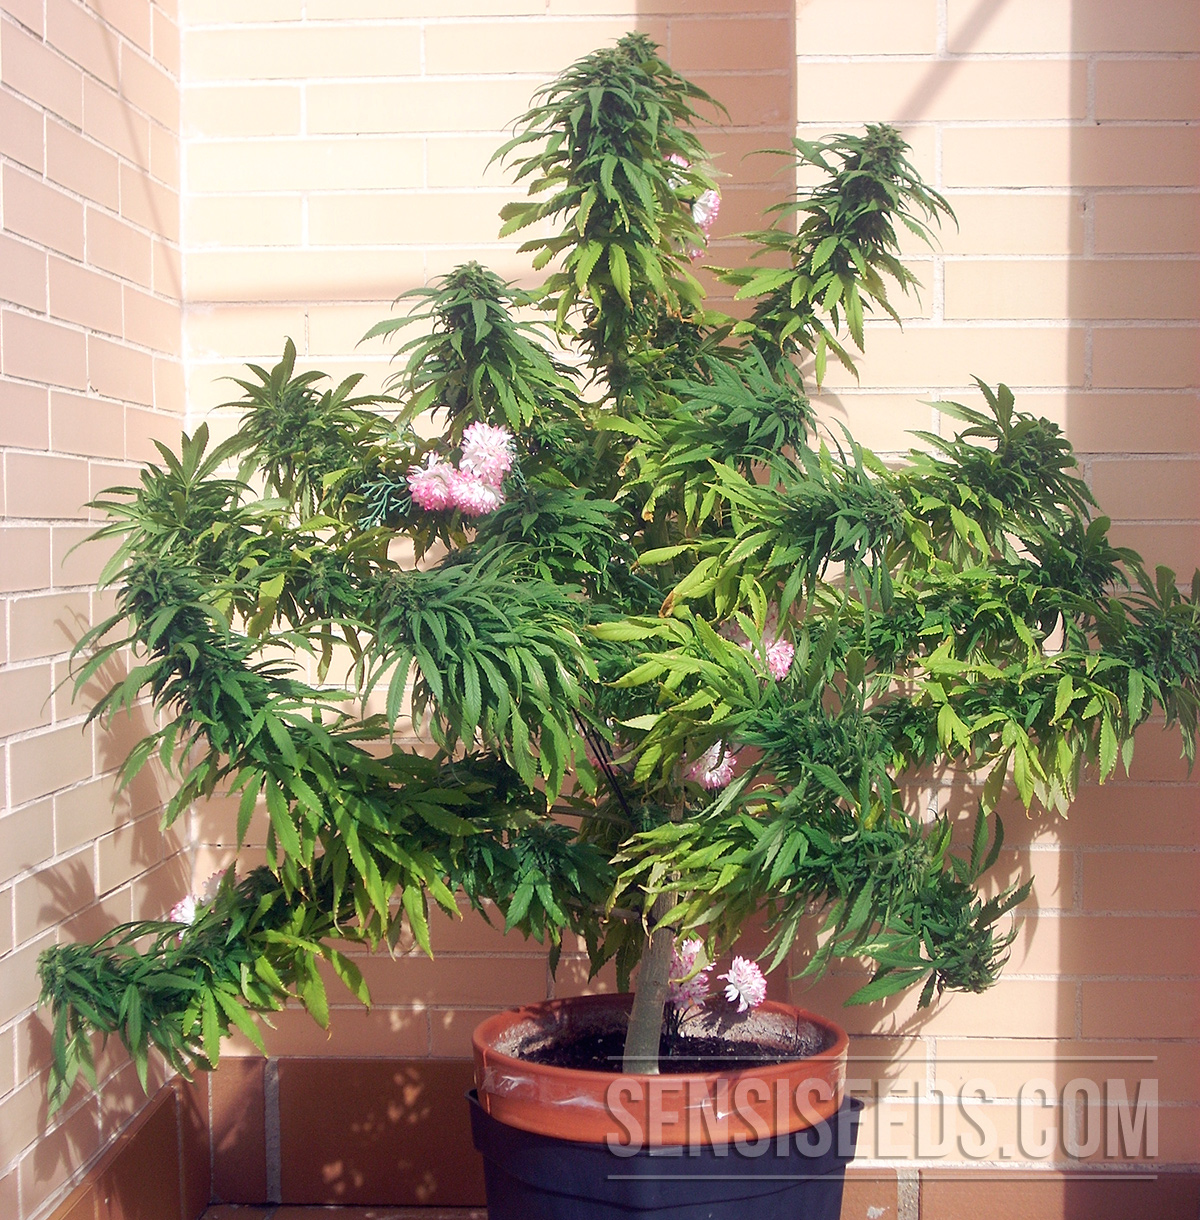 focus sur une vari t de cannabis afghani 1 de sensi seeds. Black Bedroom Furniture Sets. Home Design Ideas